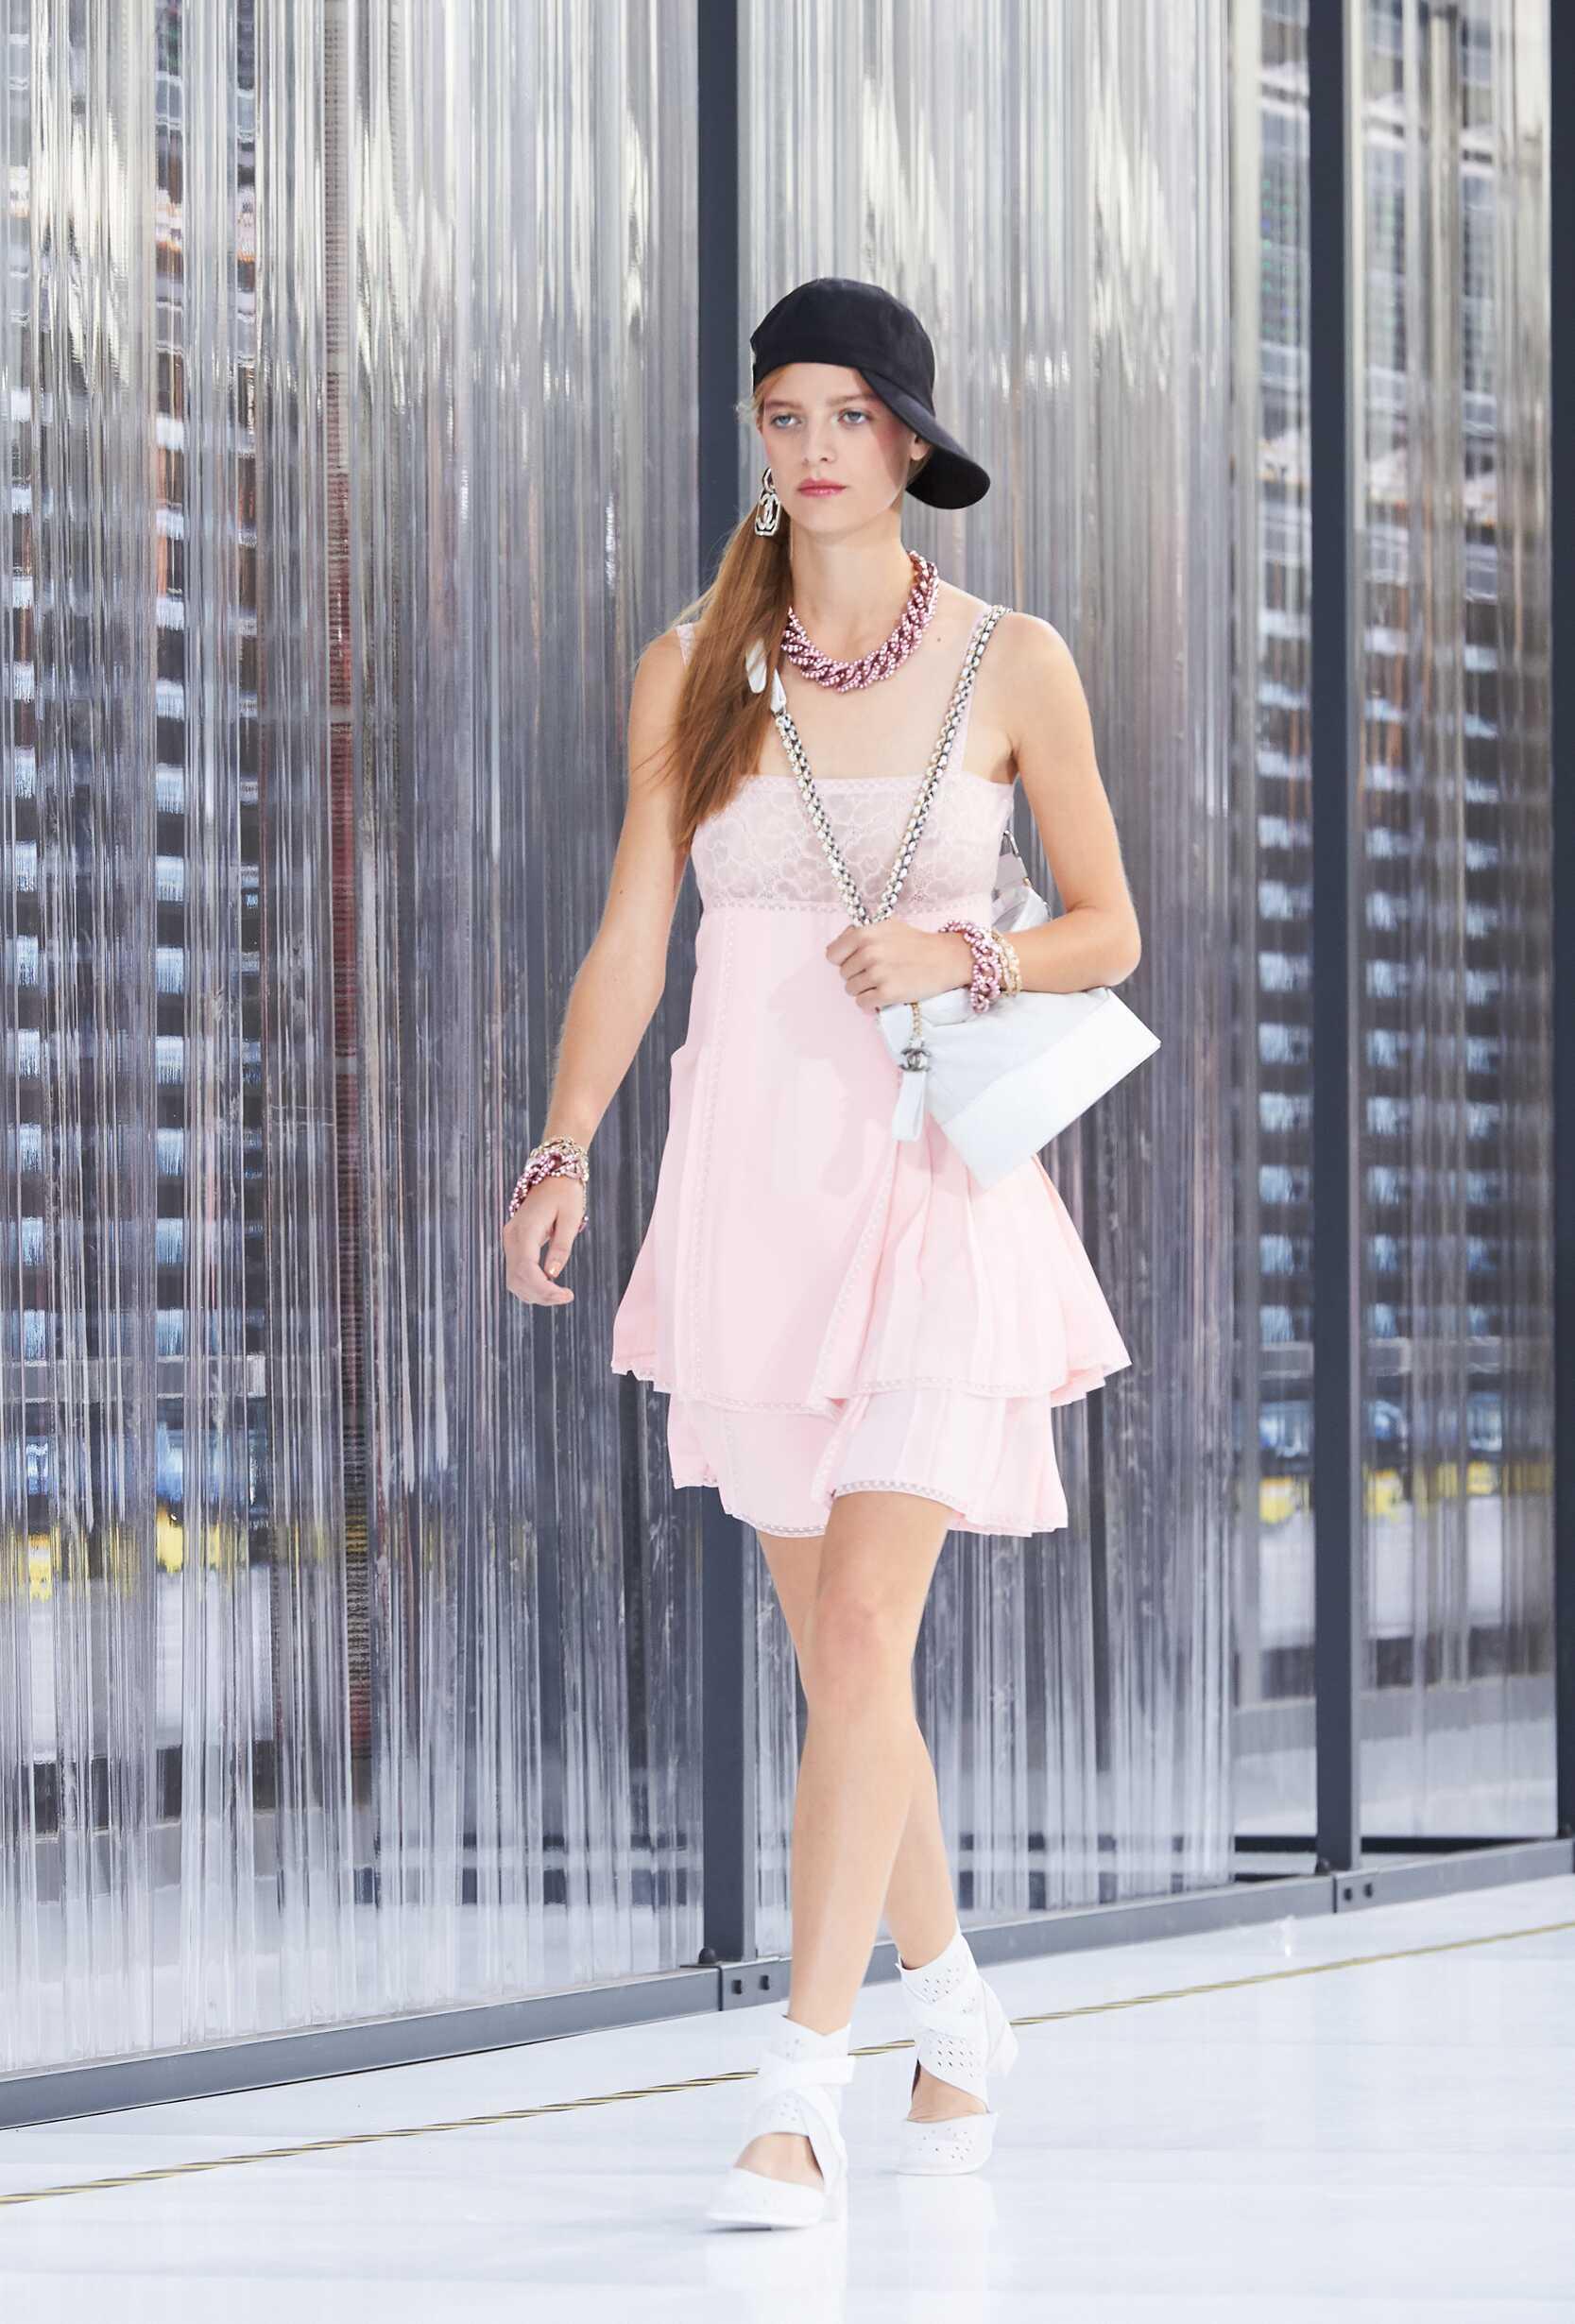 2017 Chanel Summer Runway Show Woman